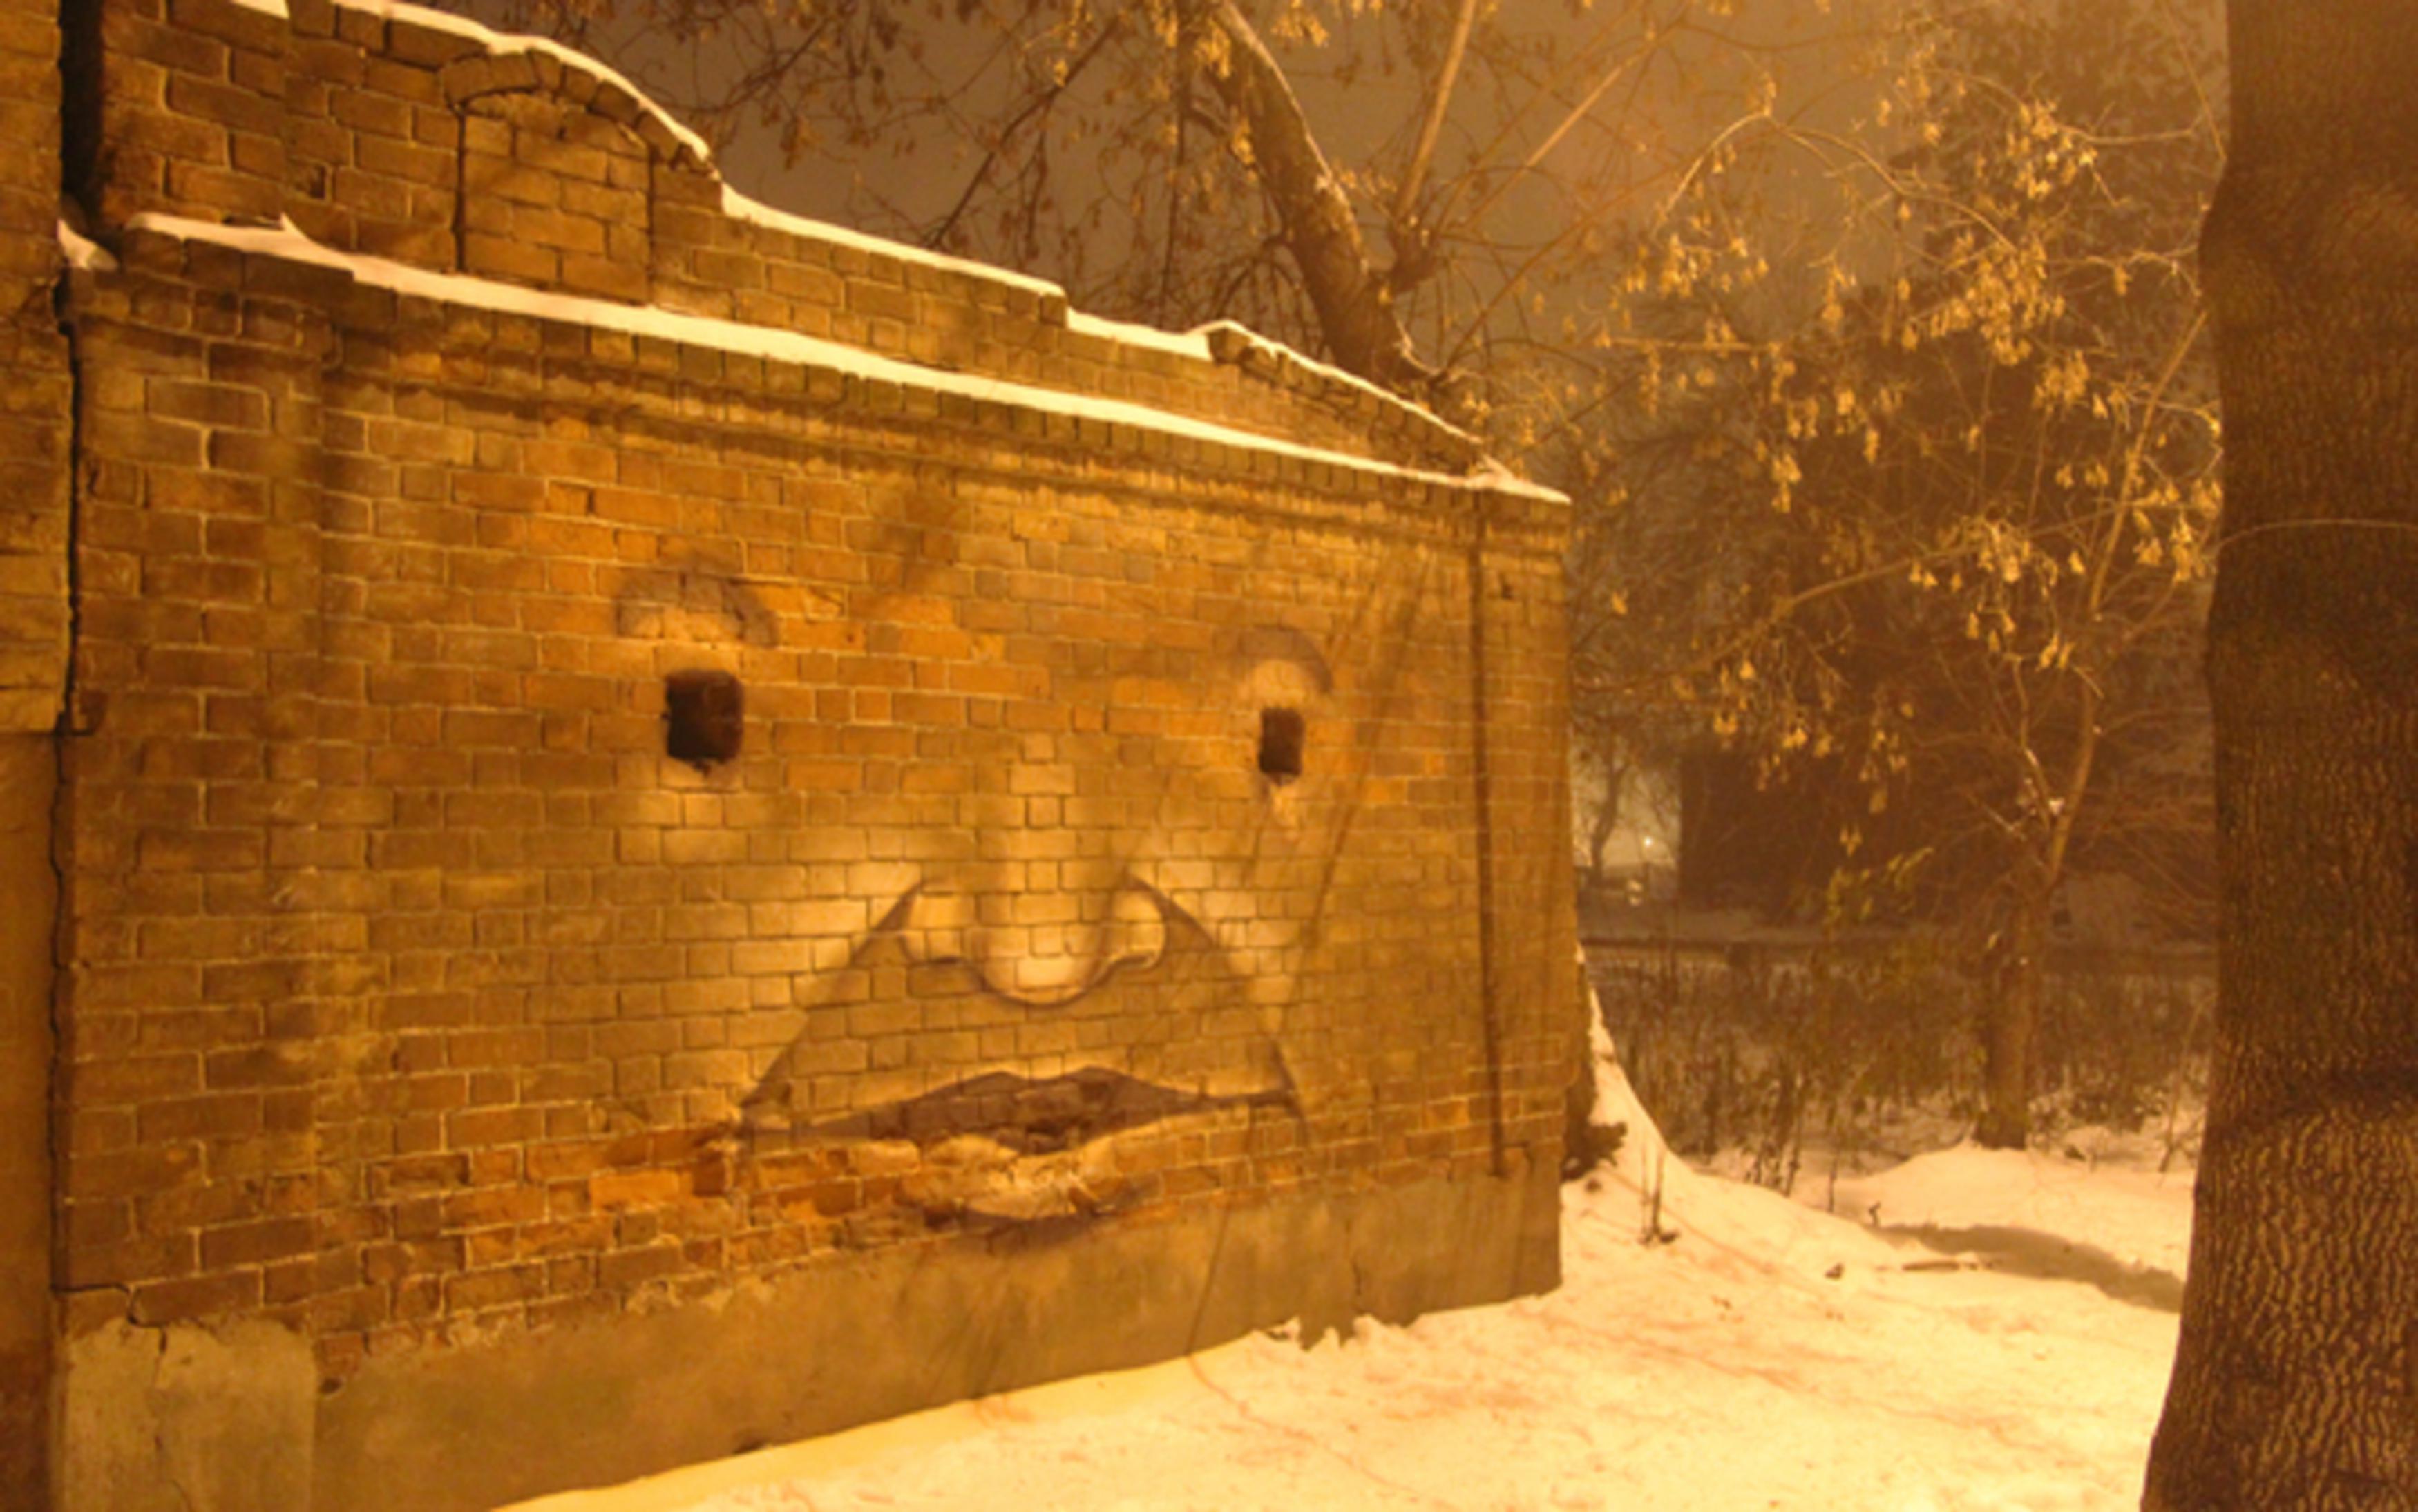 Nikita Nomerz graffiti arte de rua russo faces vida (21)